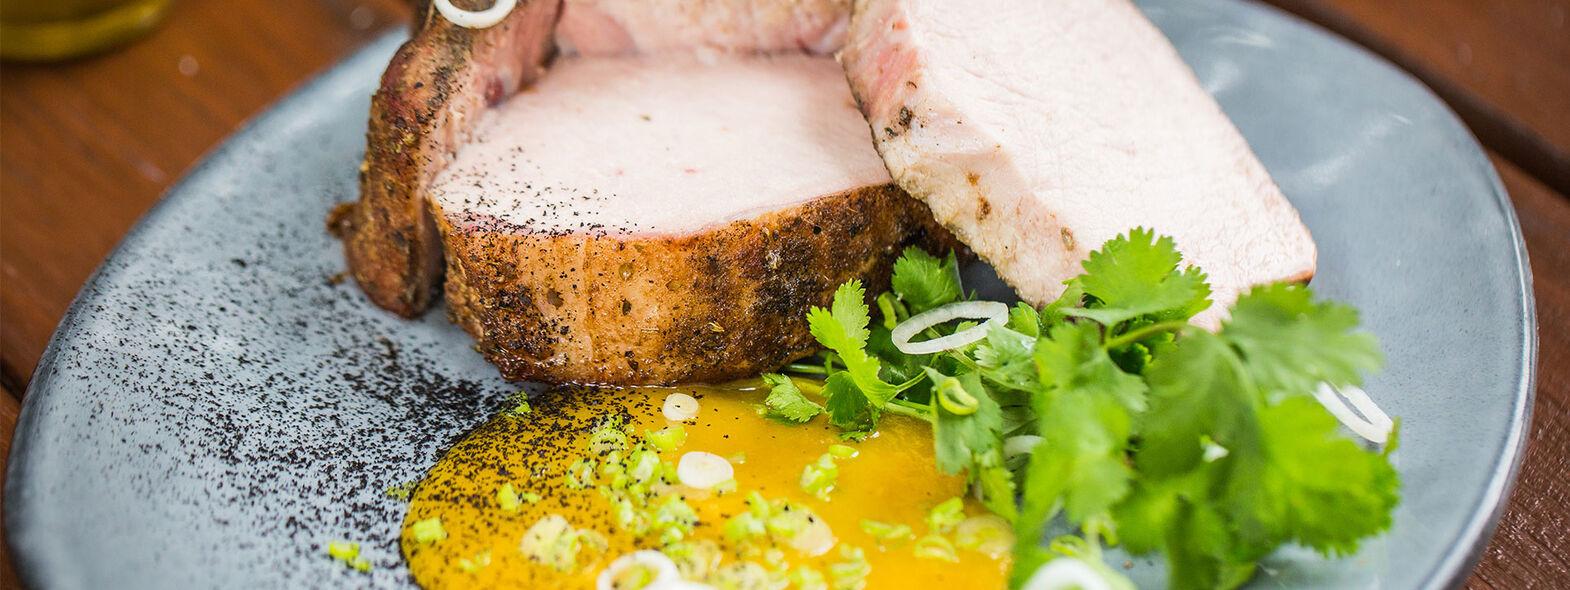 Chuleta de Cerdo Ahumada con Salsa de Mango